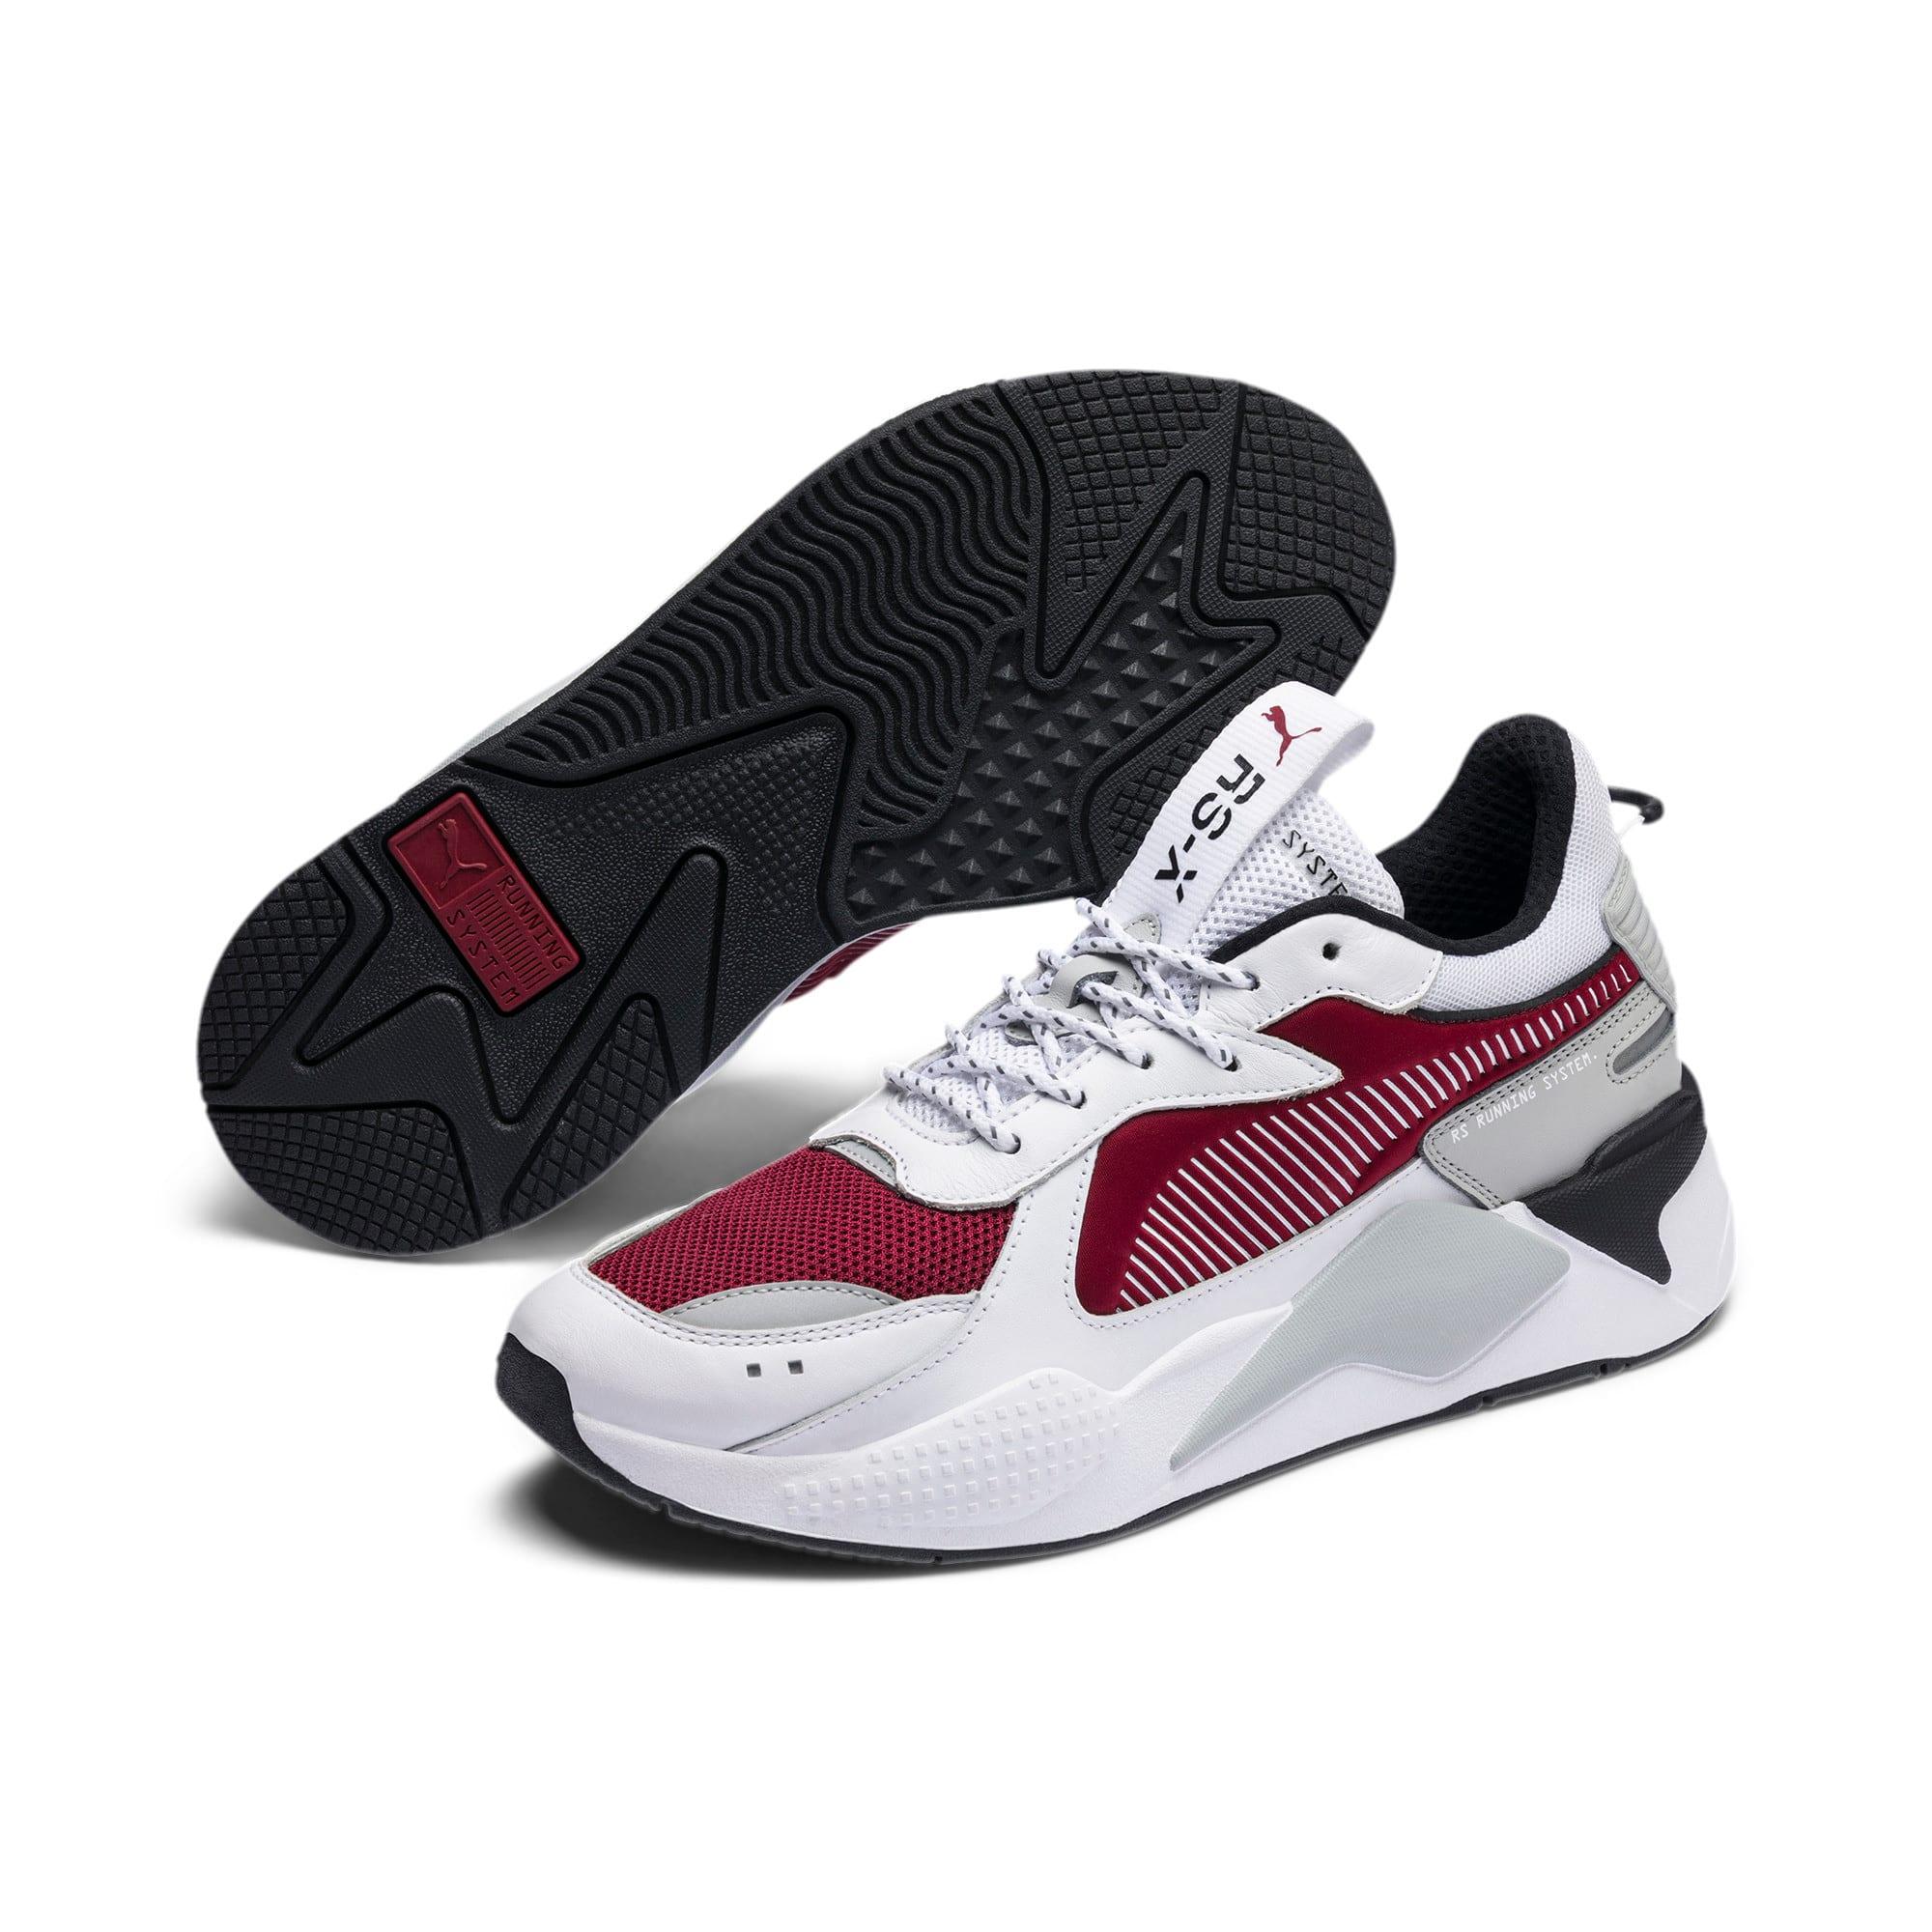 Thumbnail 3 of RS-X Core Sneakers, Puma White-Rhubarb, medium